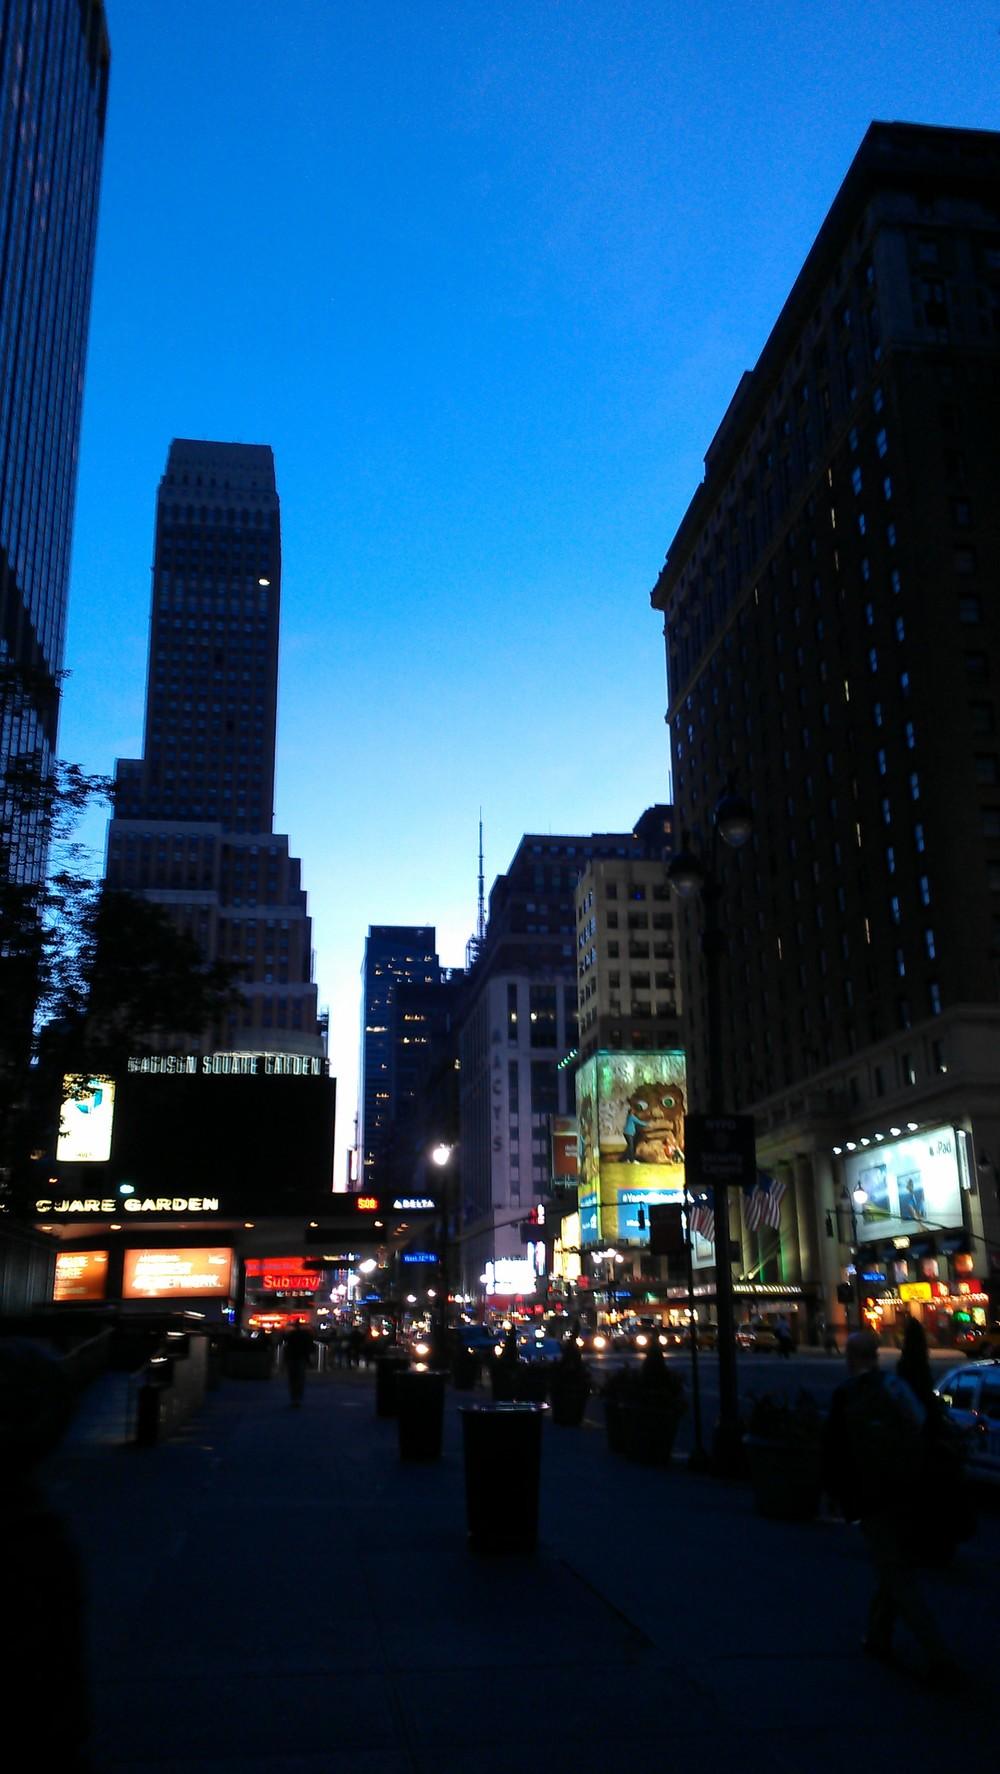 Downtown at 6am....good morning!